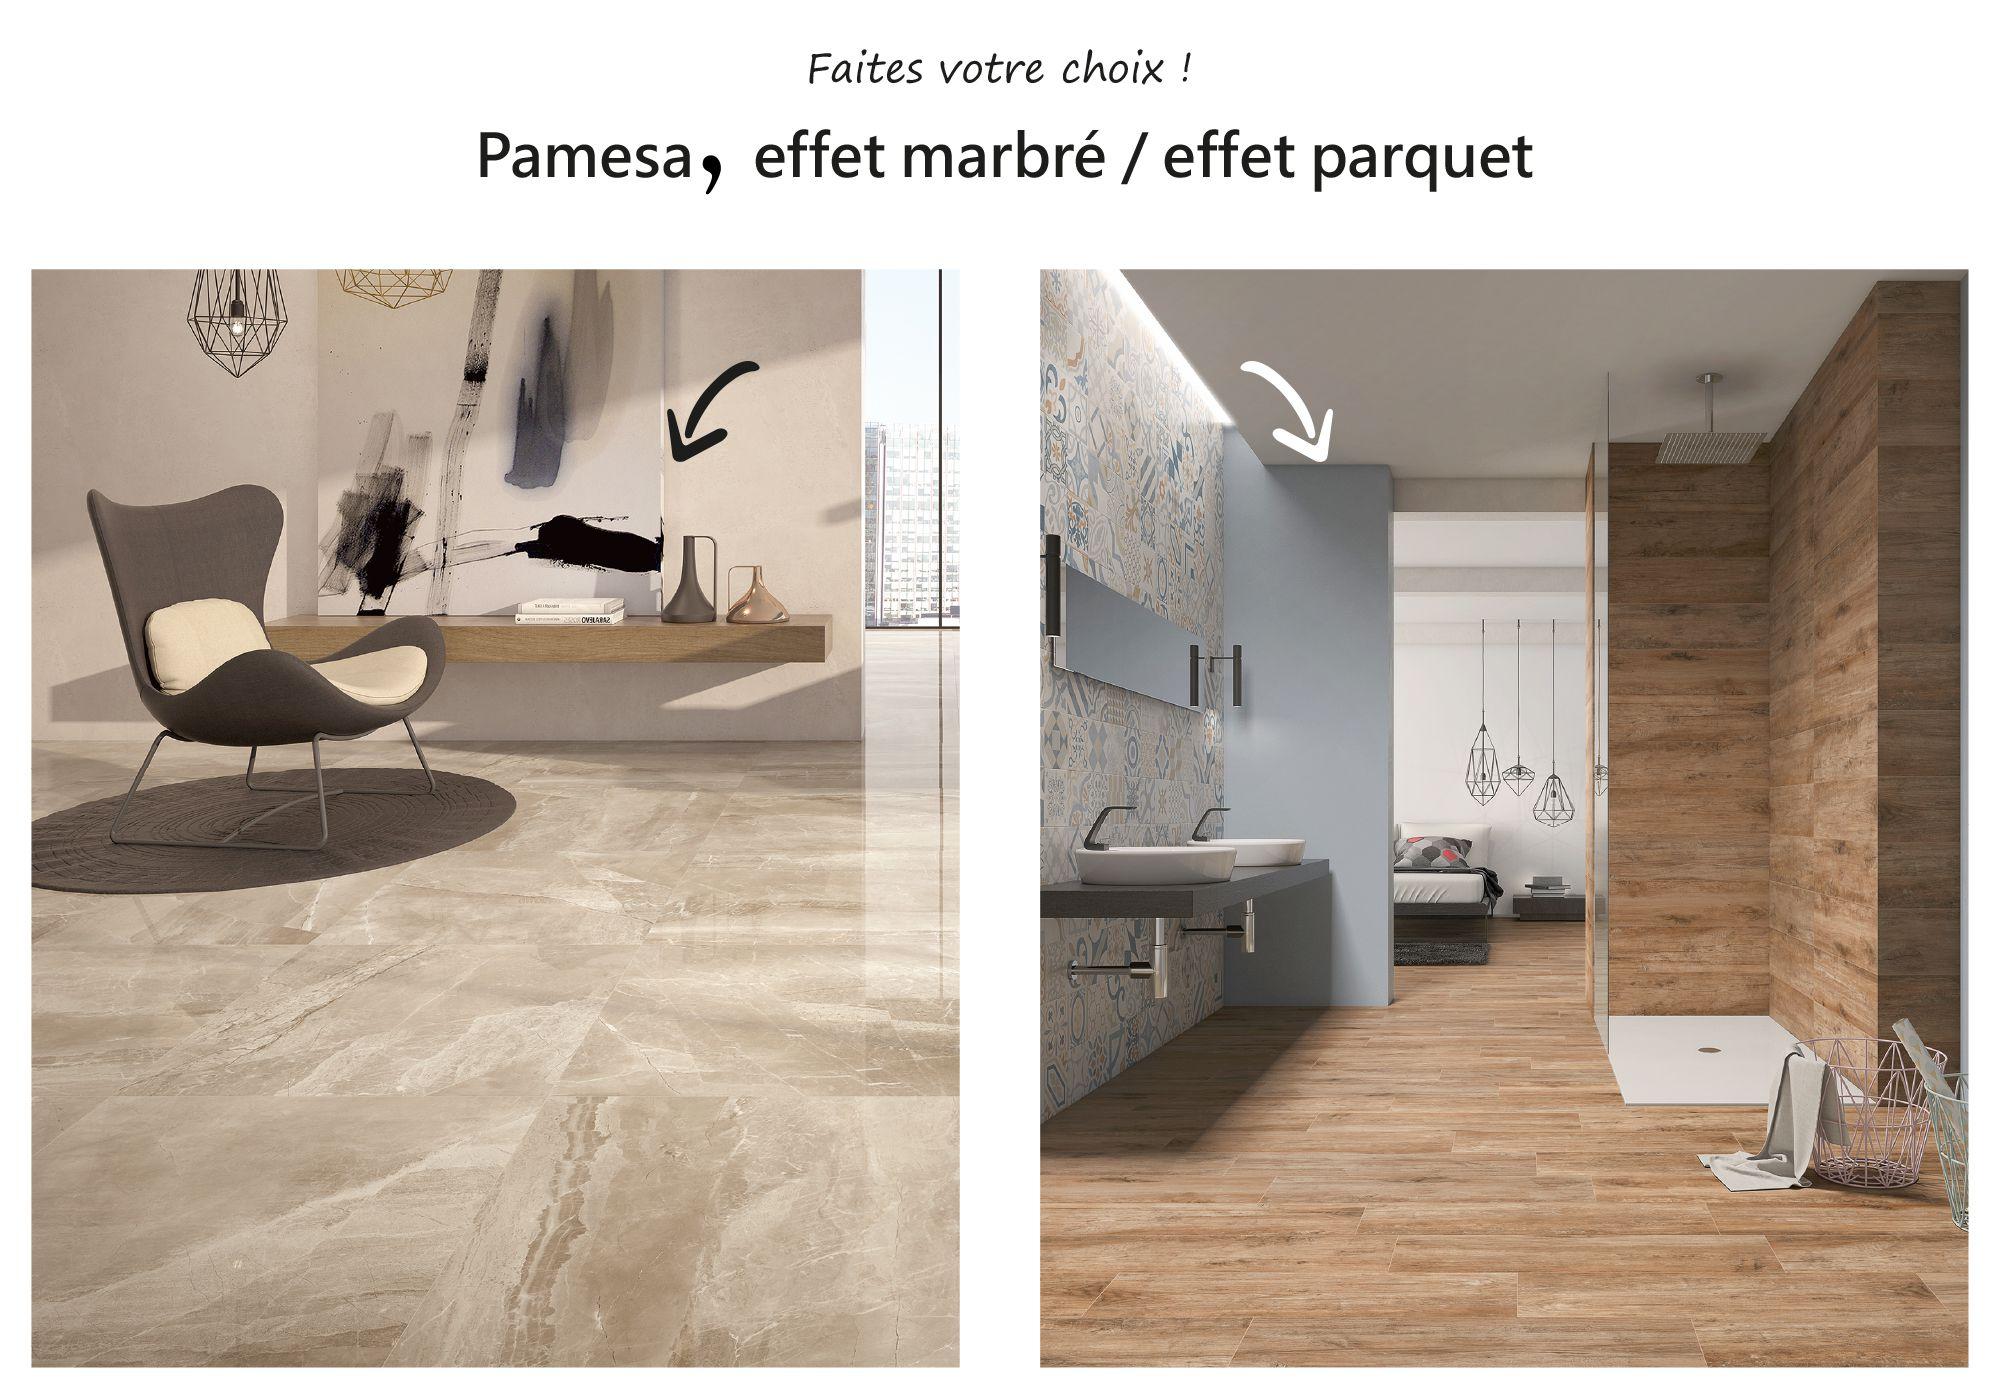 Miroir Salle De Bain Sfax ~ promodar quipements de cuisine tunisie salles de bains